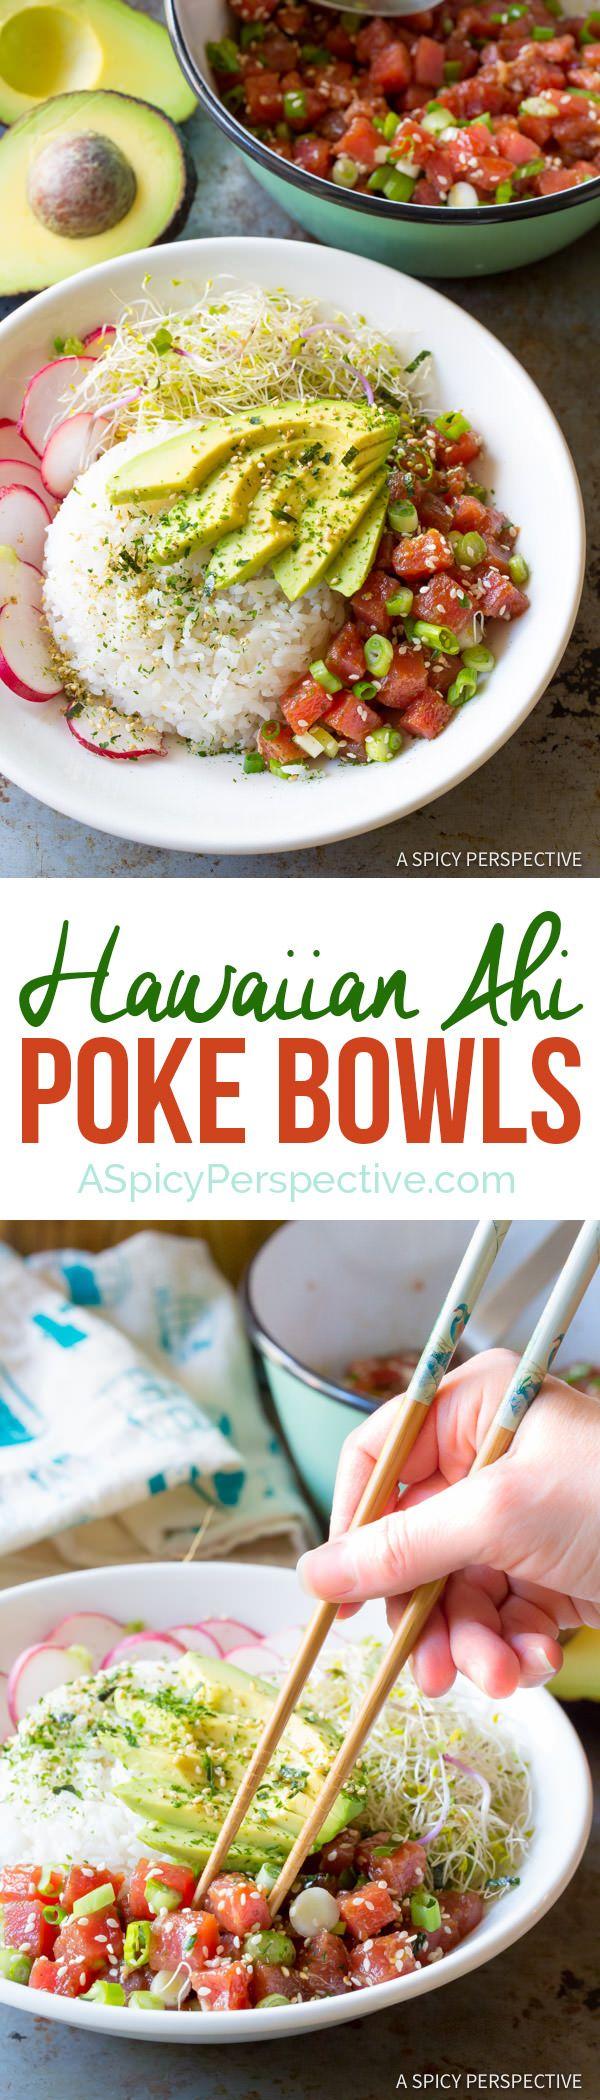 Healthy Hawaiian Ahi Poke Bowl Recipe (Gluten Free)  ASpicyPerspective.com